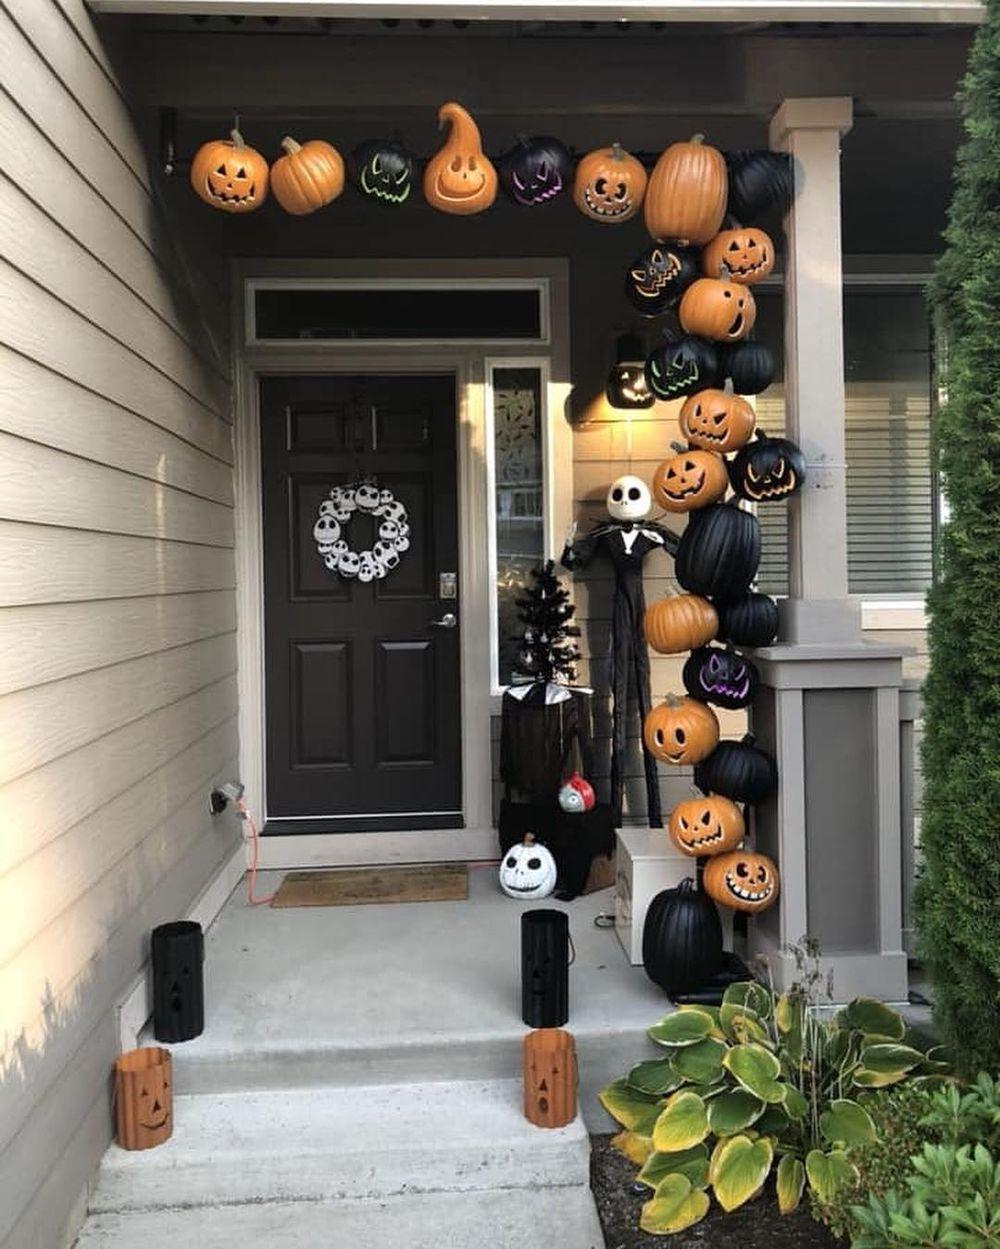 Halloween front porch via @disneyaddictslivehere